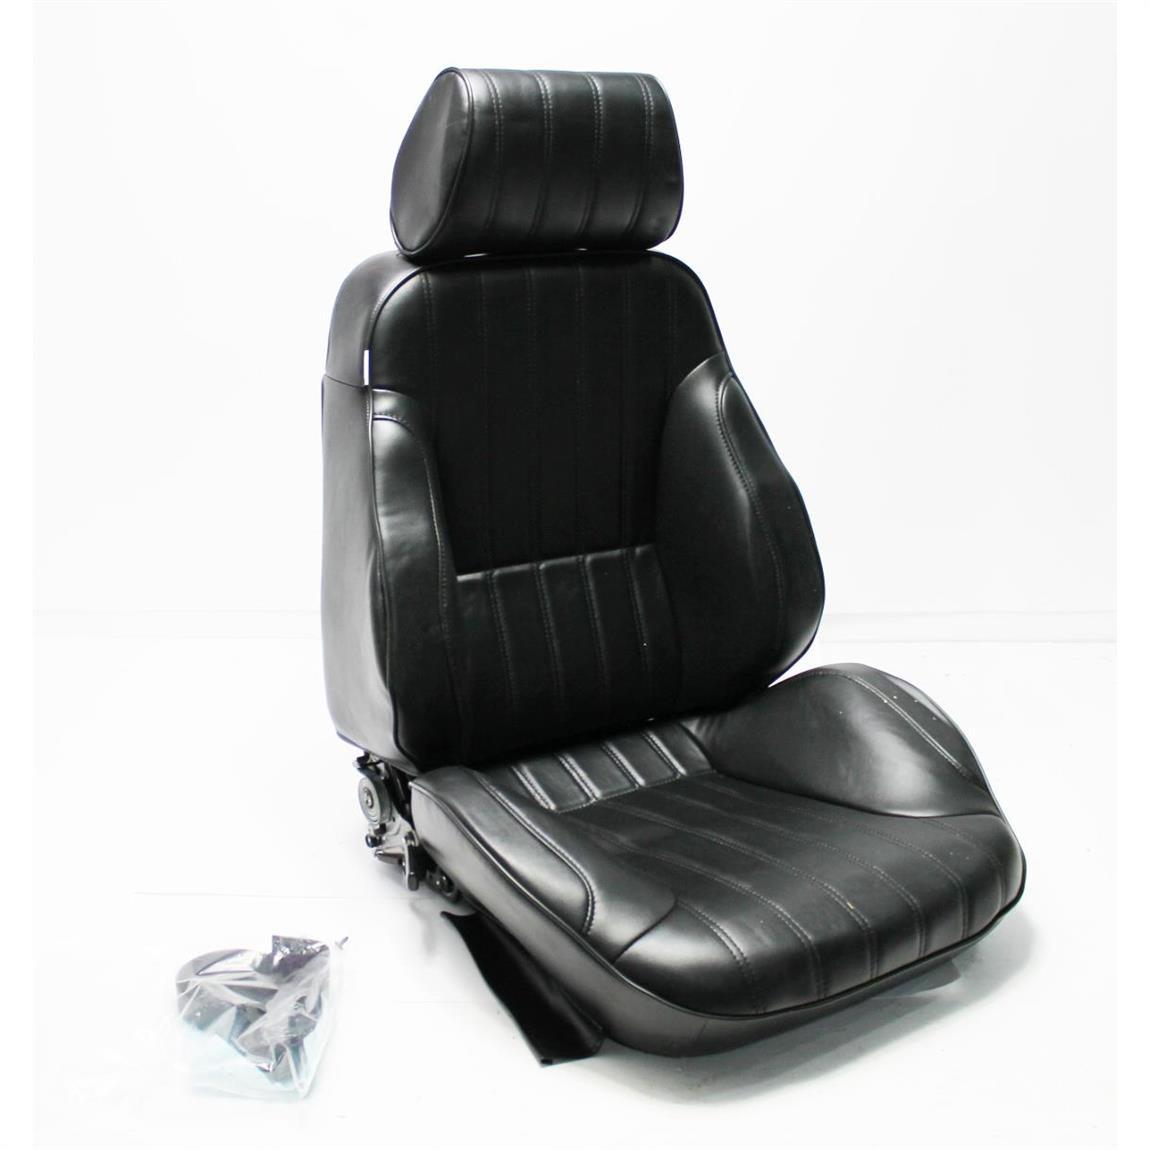 Garage Sale Scat Procar Rally 1000 Series Bucket Seat Passenger